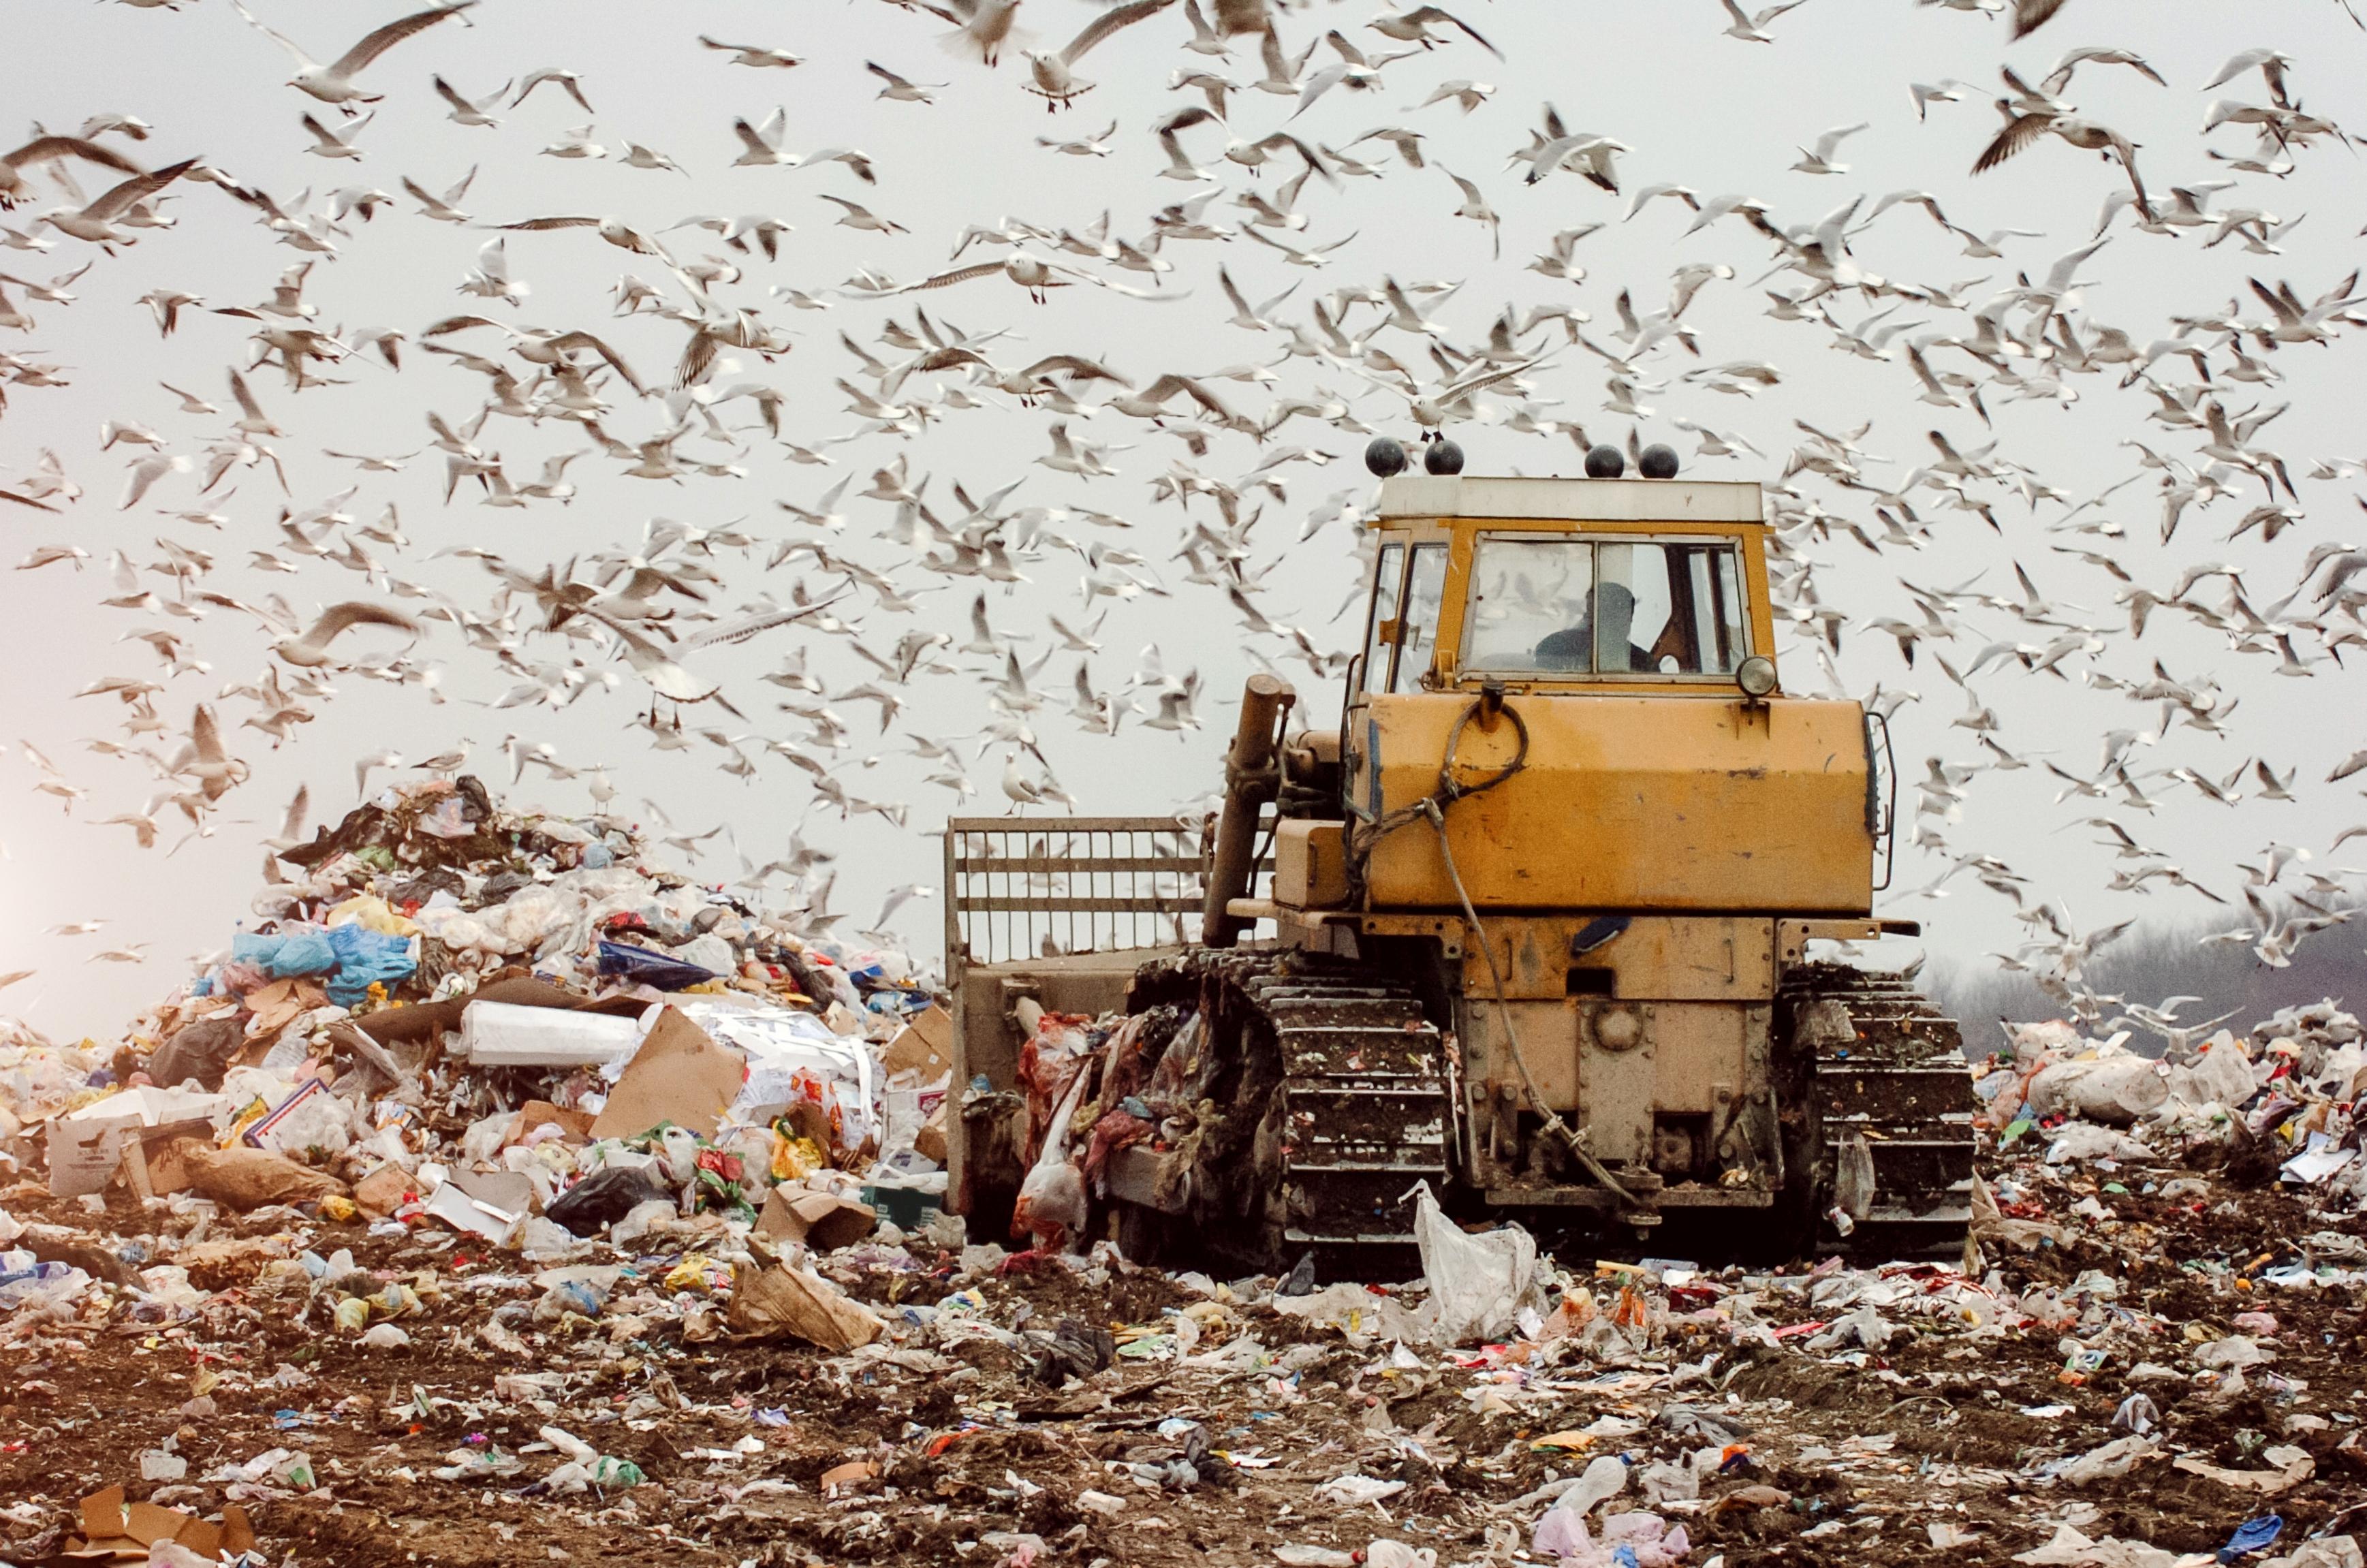 EU Europa Nachrichten Recycling Abfall Deponie